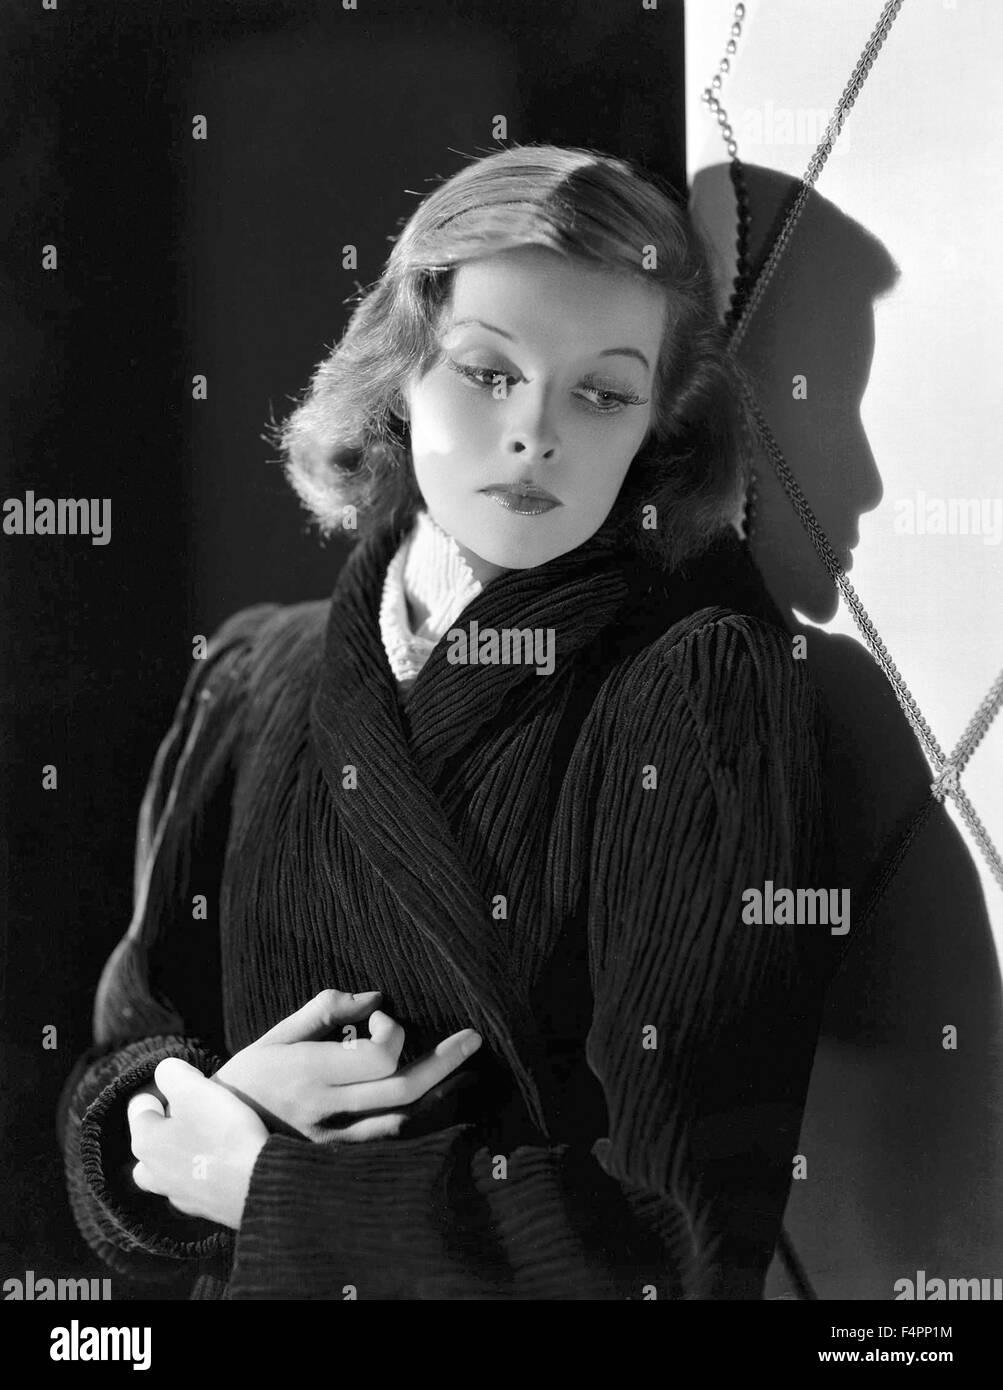 Katharine Hepburn in the 40's - Stock Image